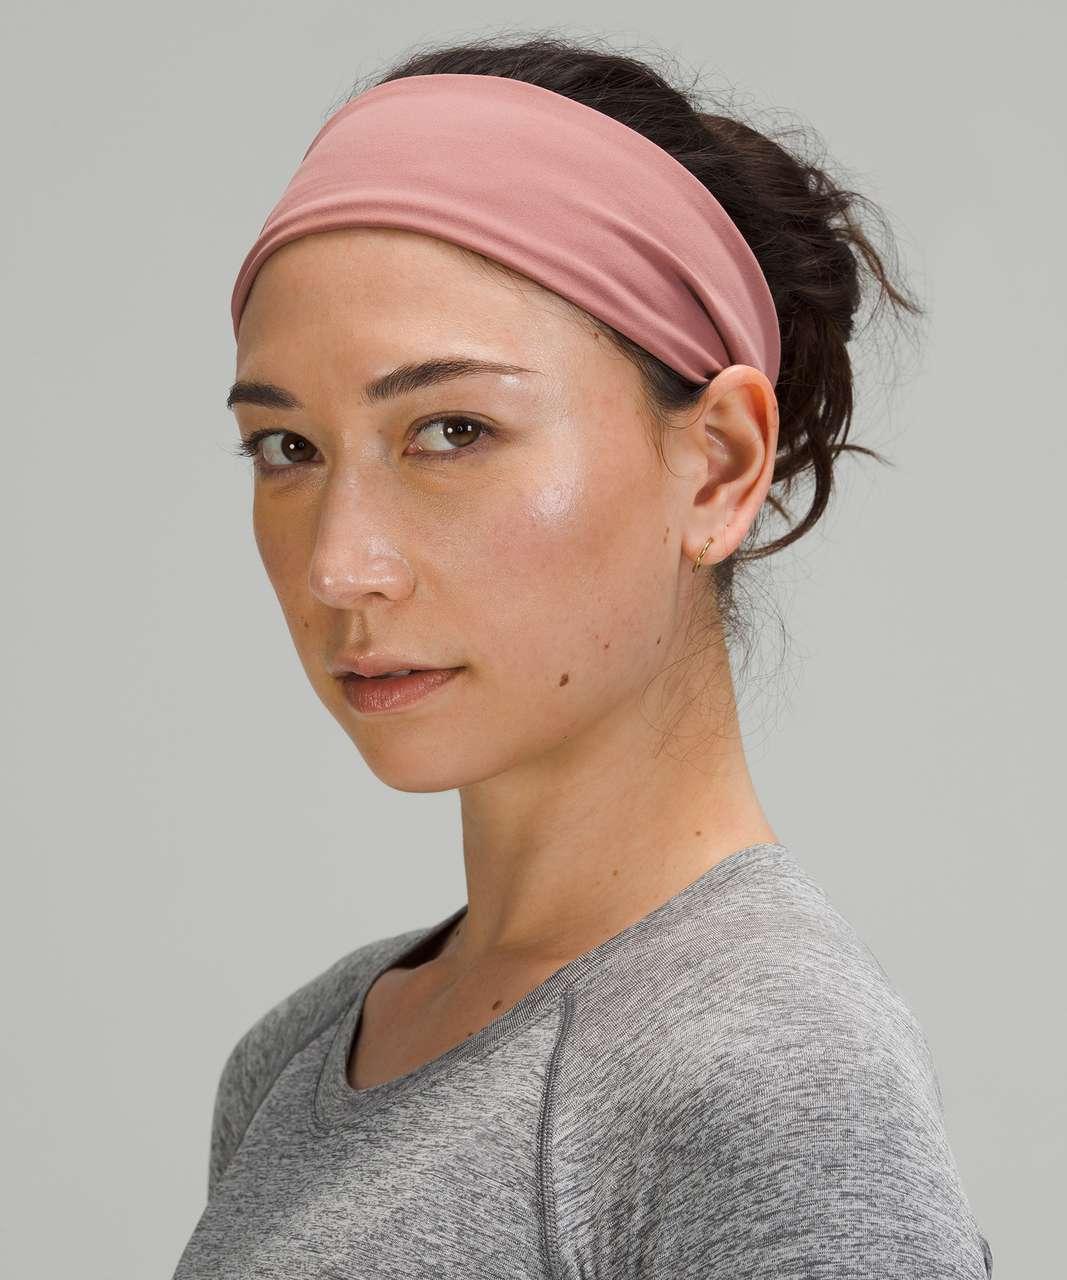 Lululemon Fringe Fighter Headband - Spiced Chai / Pink Mist